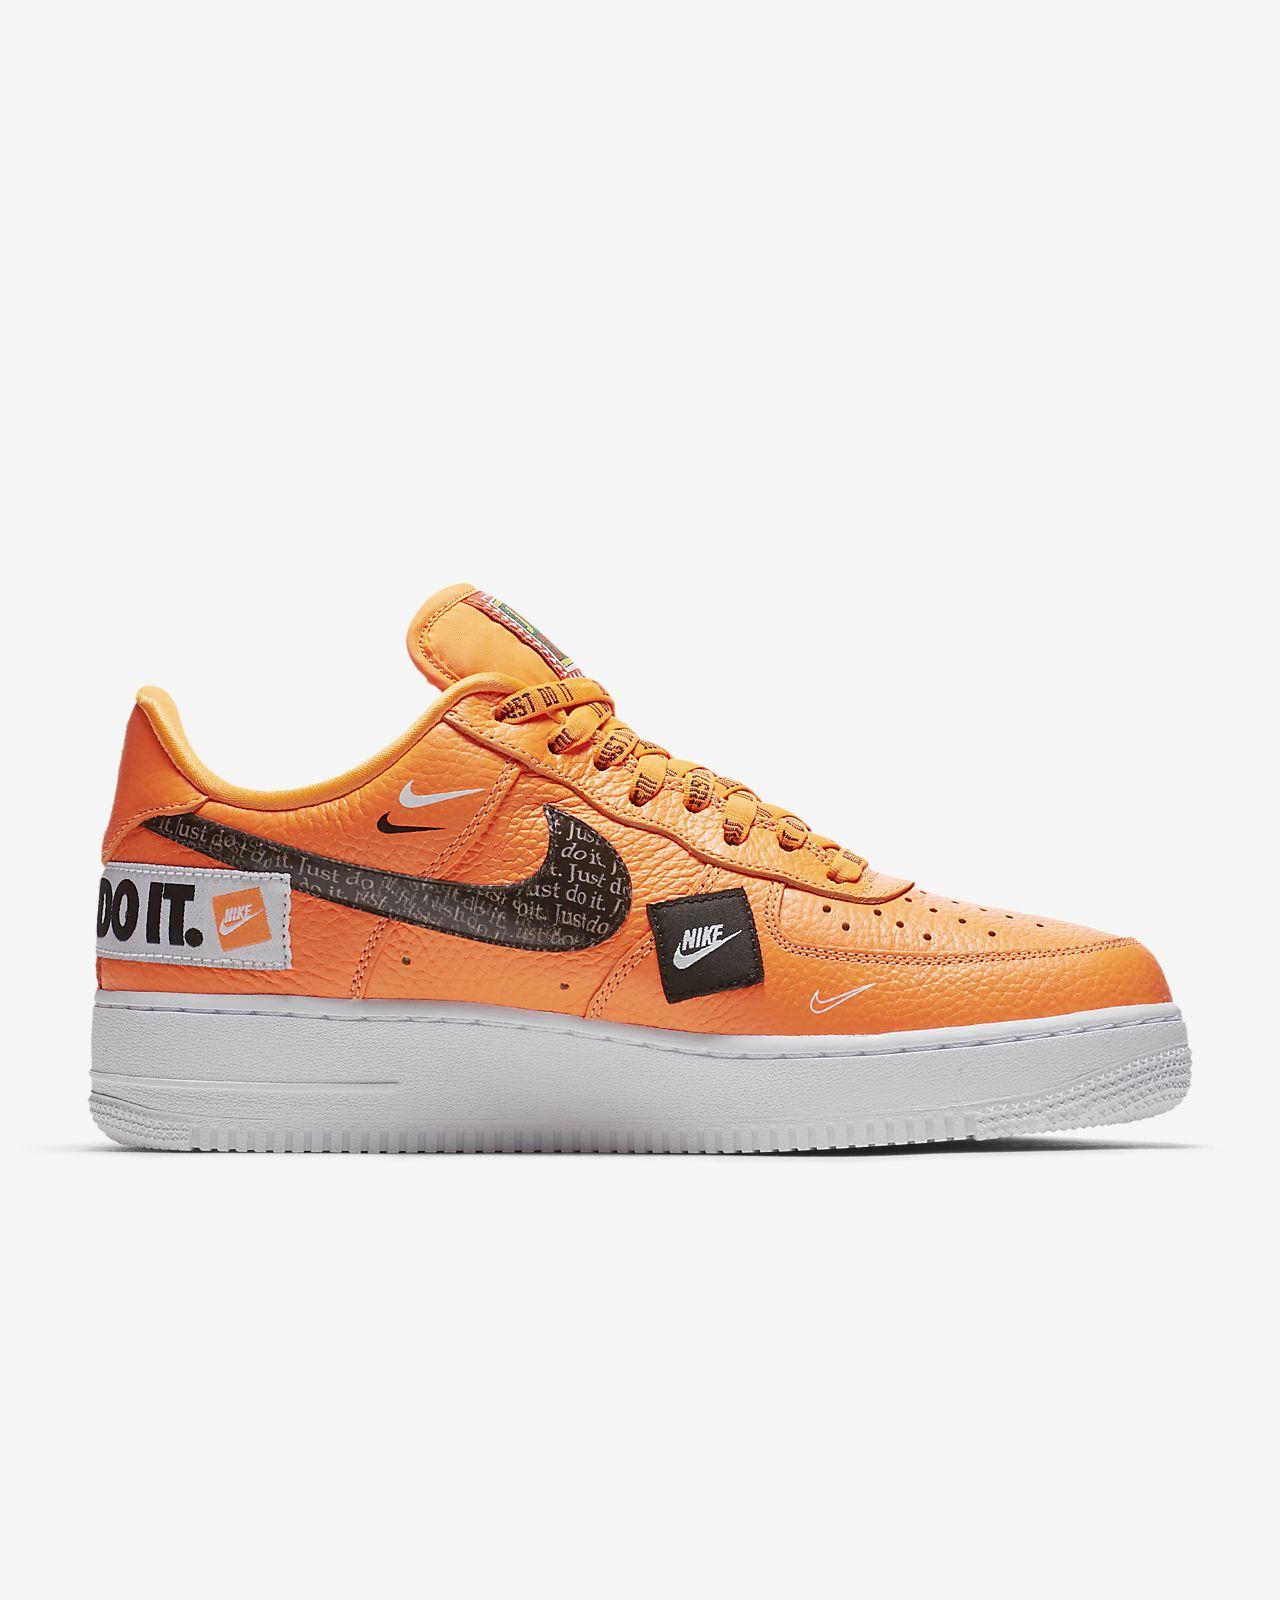 best service 18ee0 db45c ... Nike Air Force 1 07 Premium JDI Mens Shoe